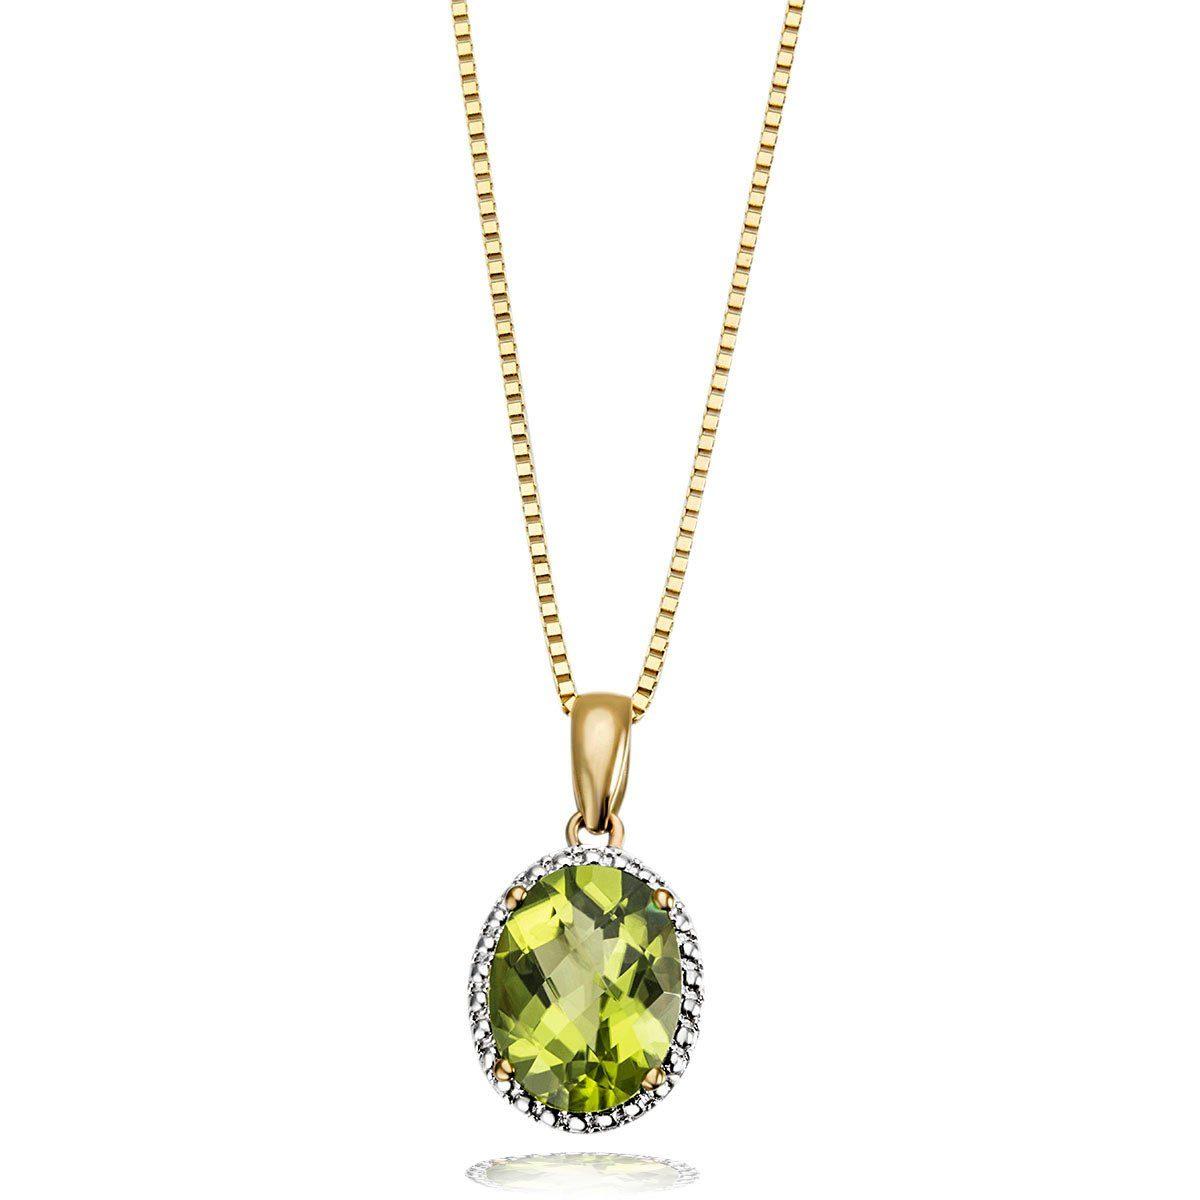 goldmaid Collier 375 Gelbgold 1 Peridot